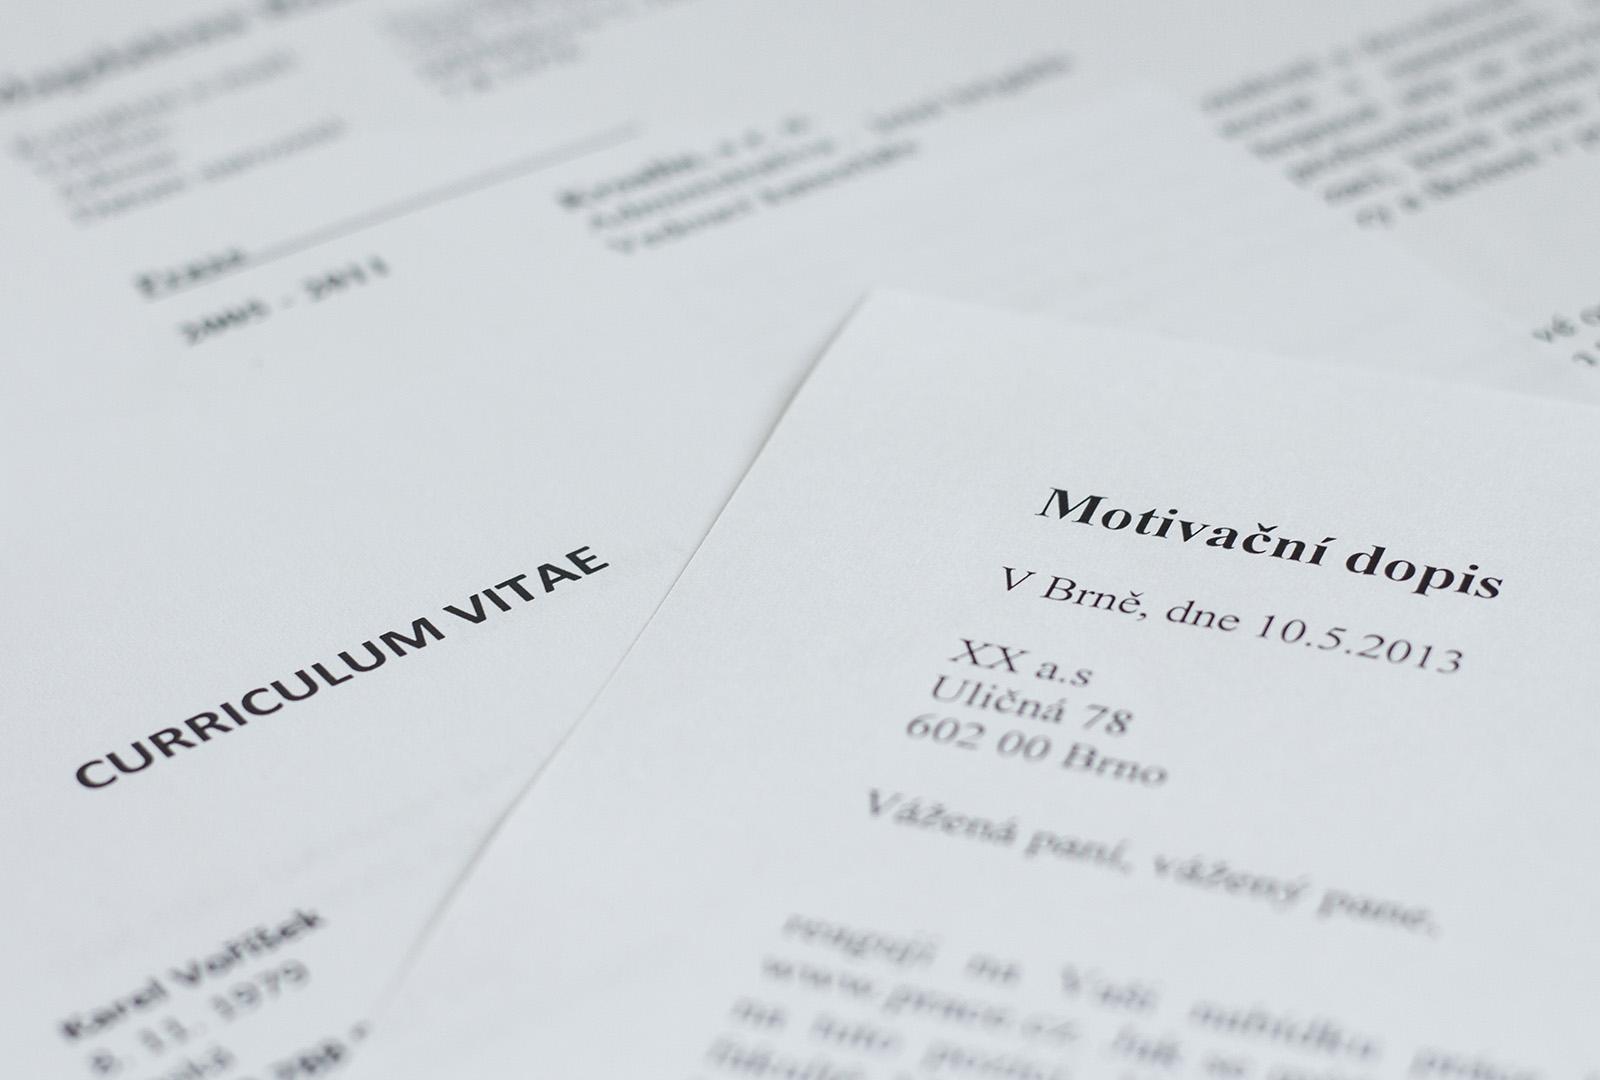 Zivotopis A Motivacni Dopis Pruvodce Personalni Psychologii